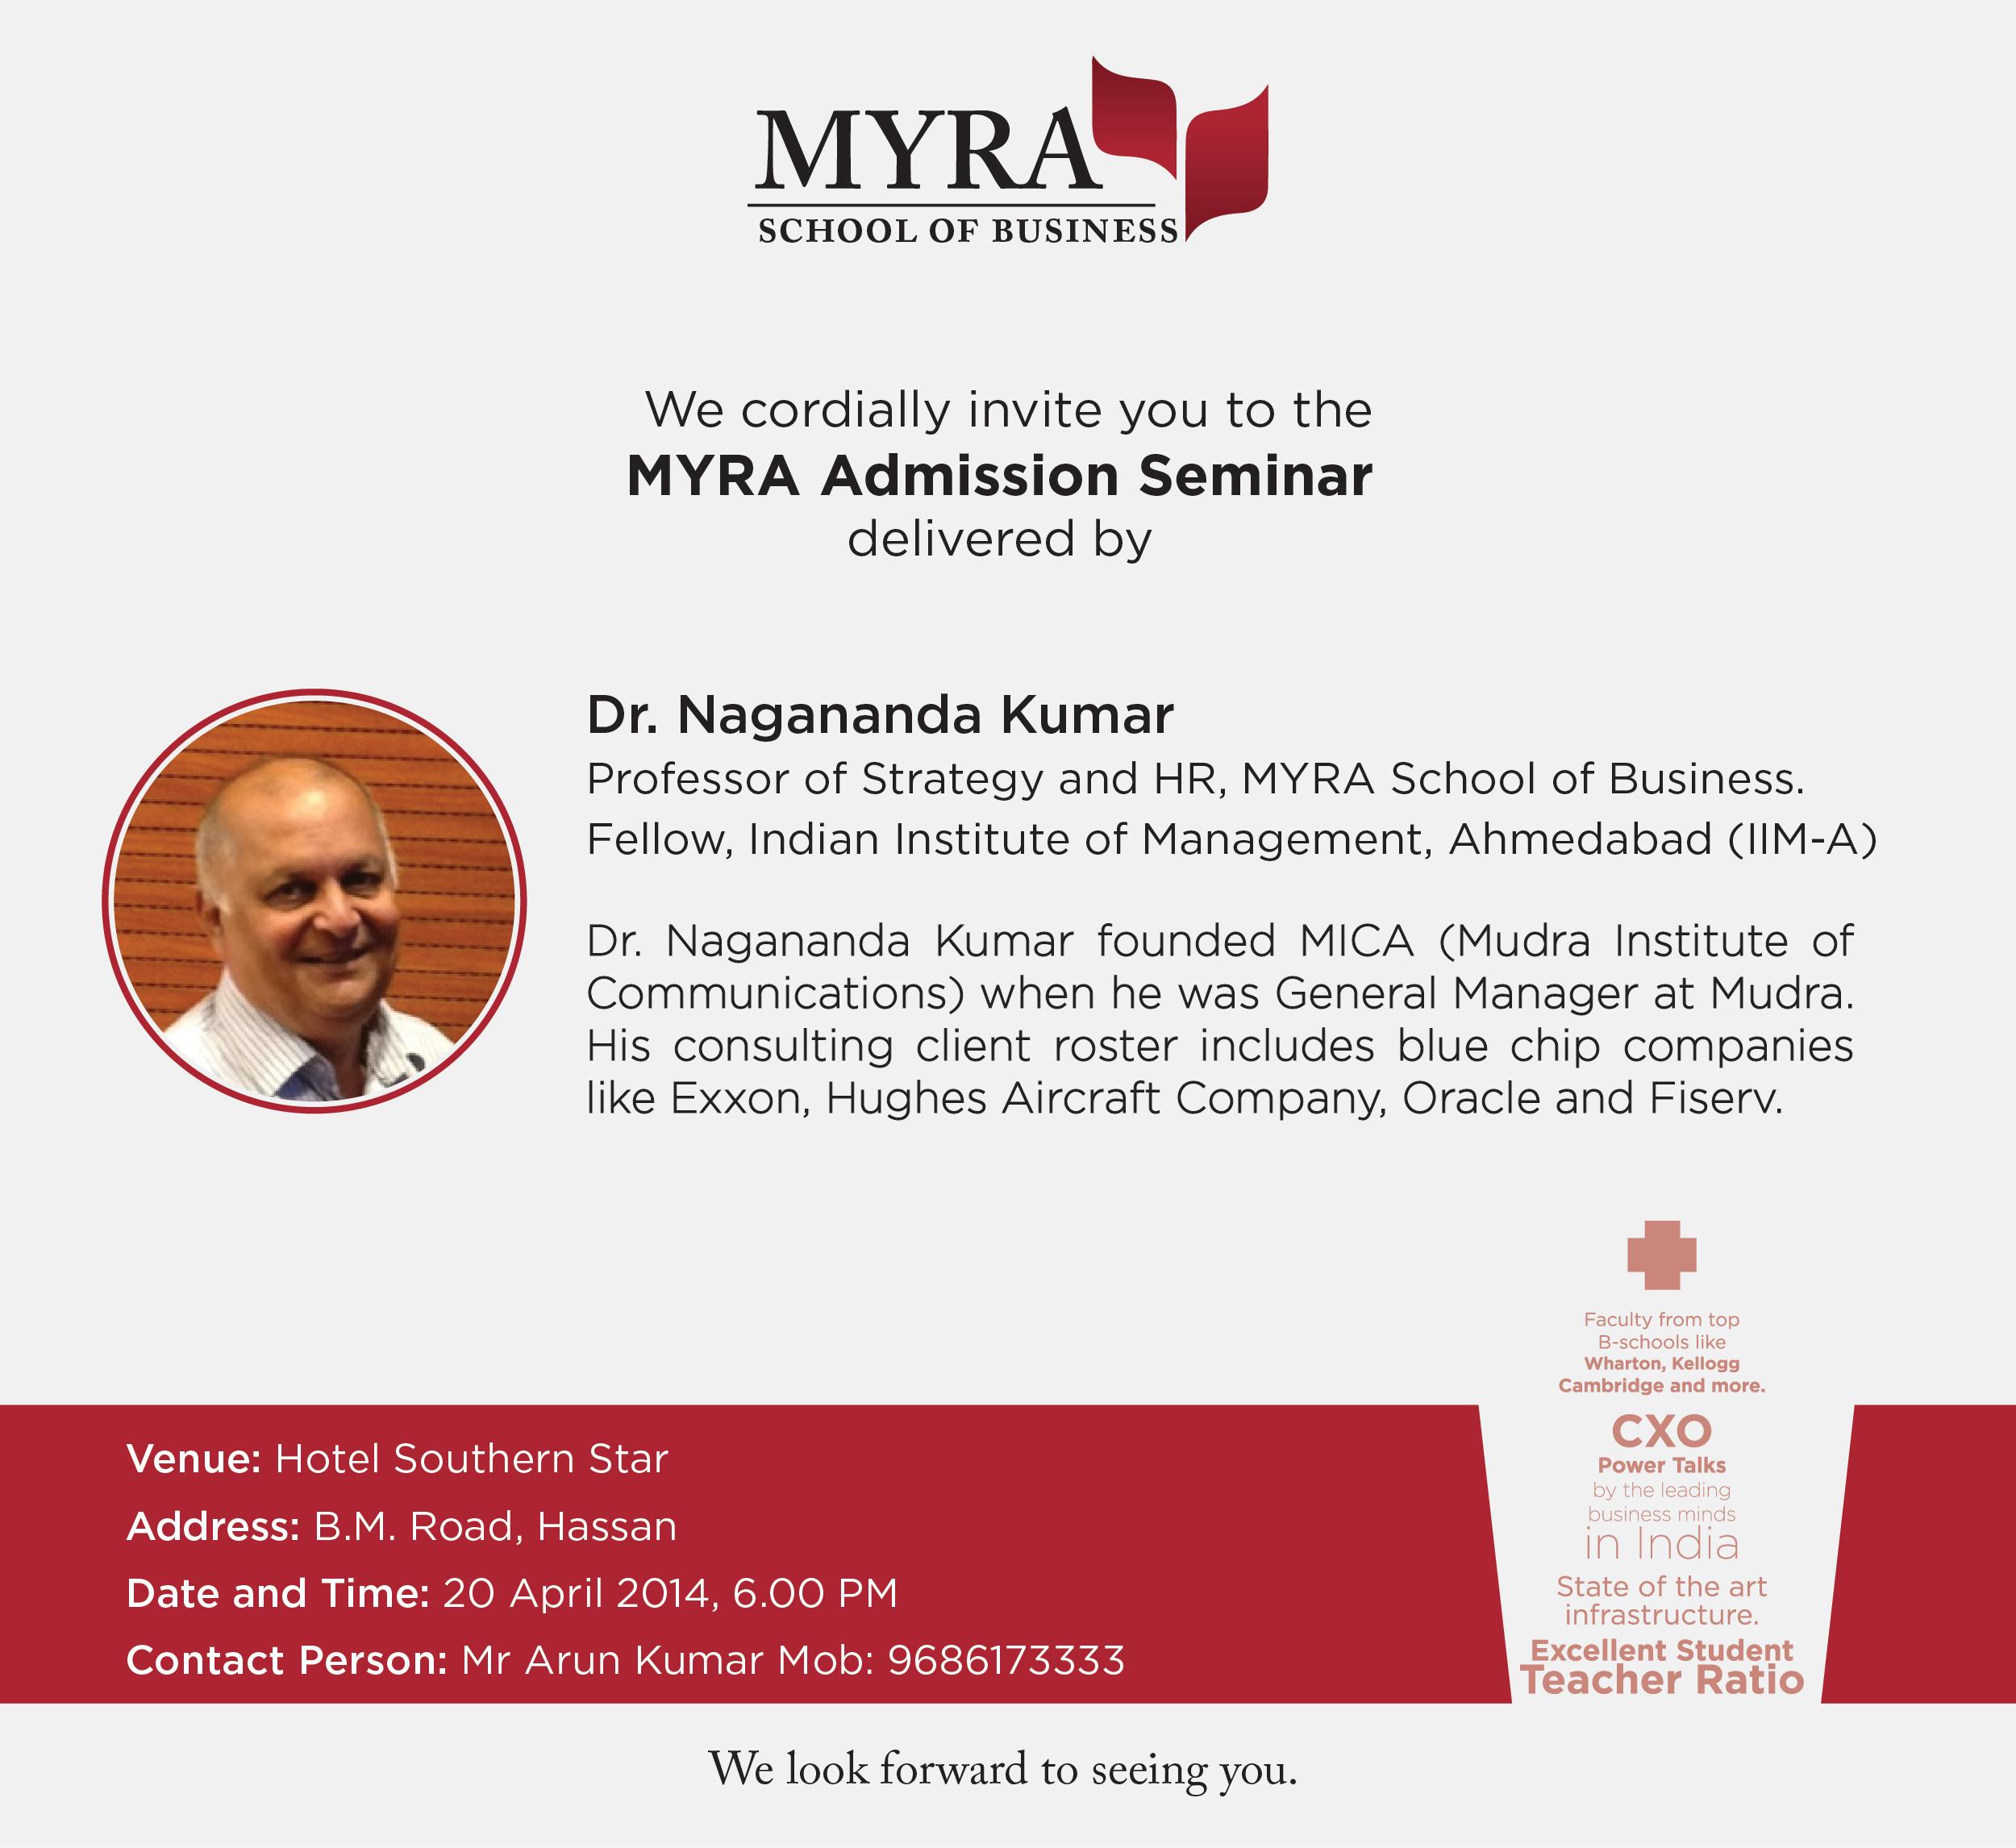 MYRA-AdmissionSeminar-Hassan_invite